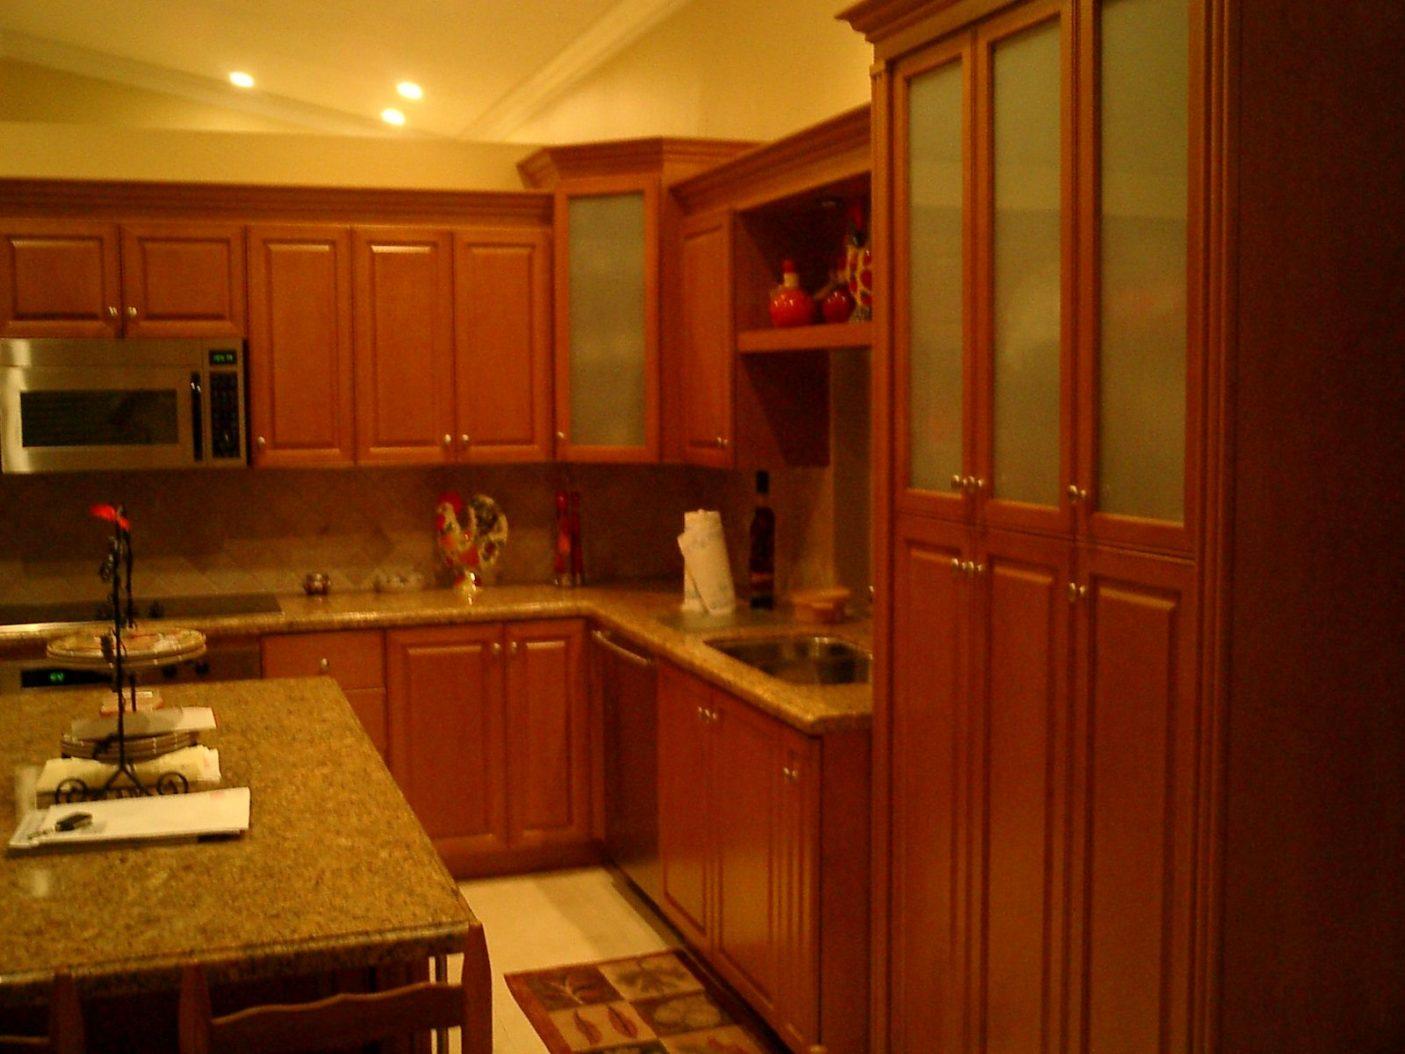 Kitchens-152.jpg